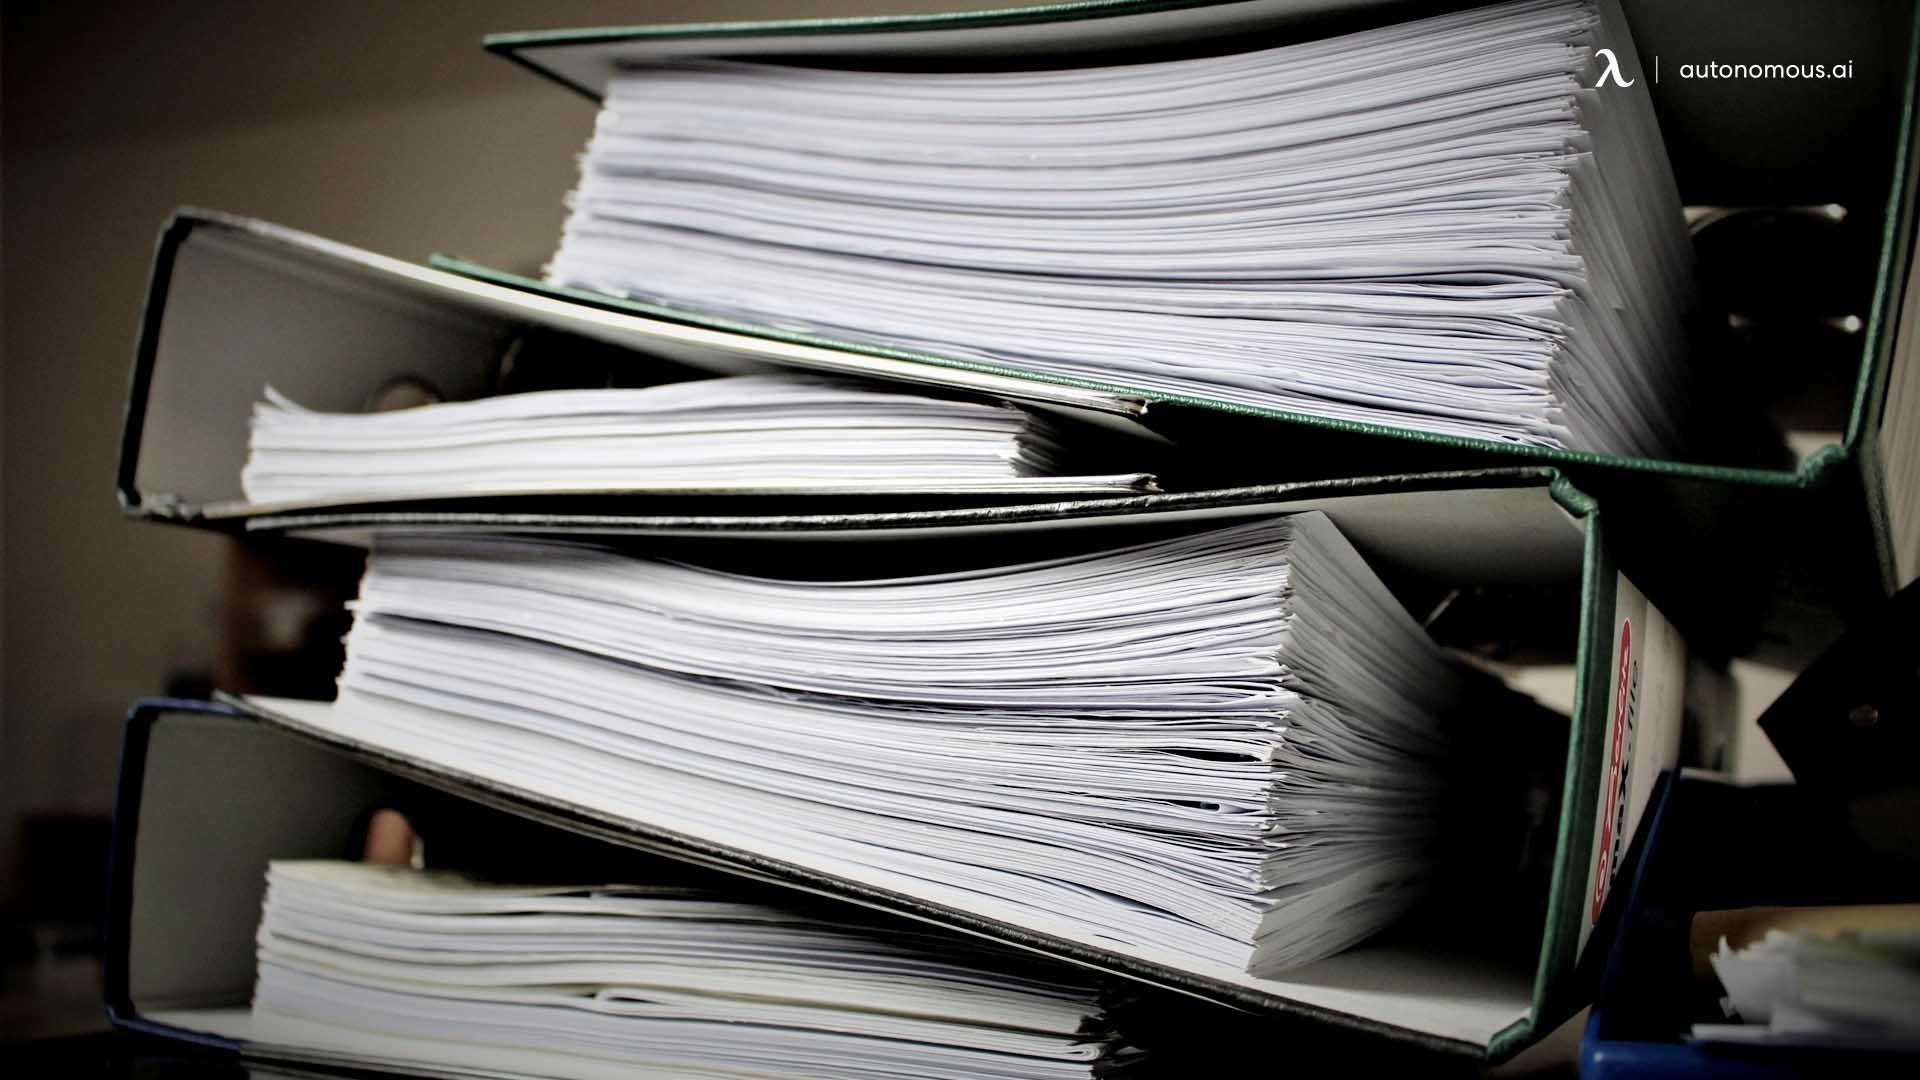 Needs Less Paperwork